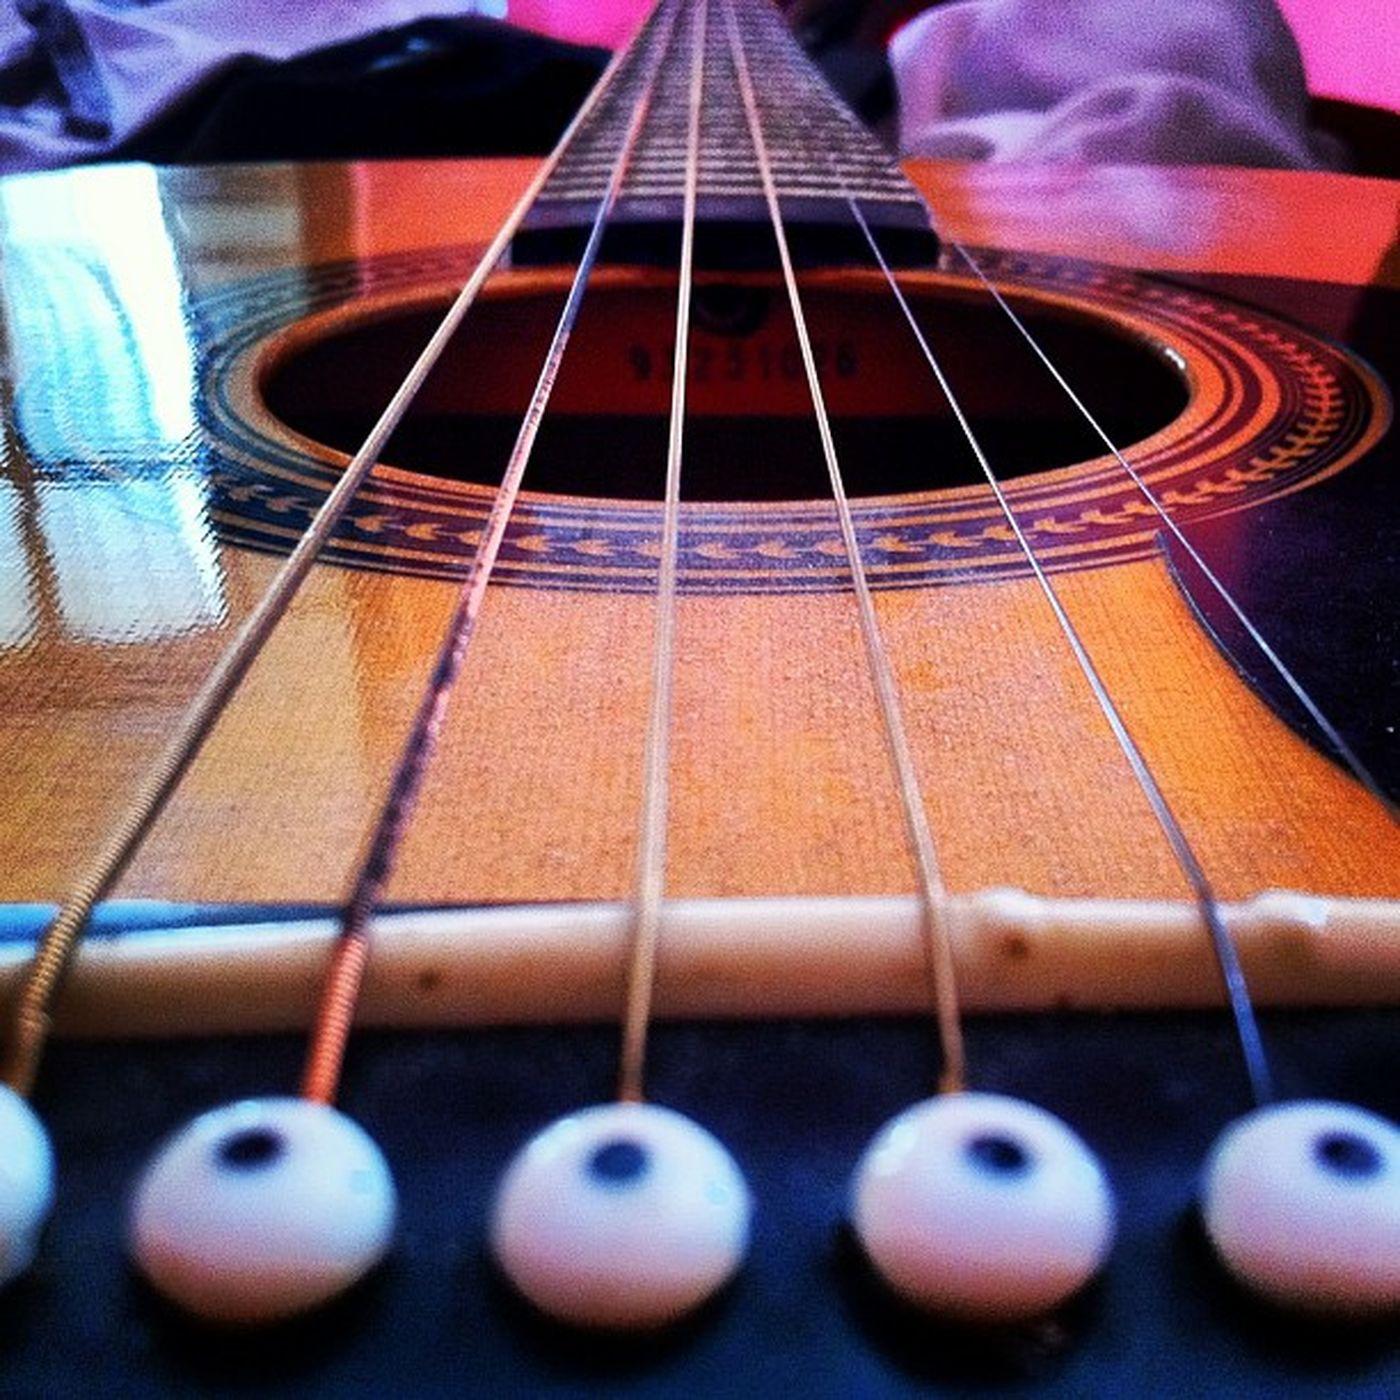 Bongistan Guitar Strings Guitarstrigs blah blah blah